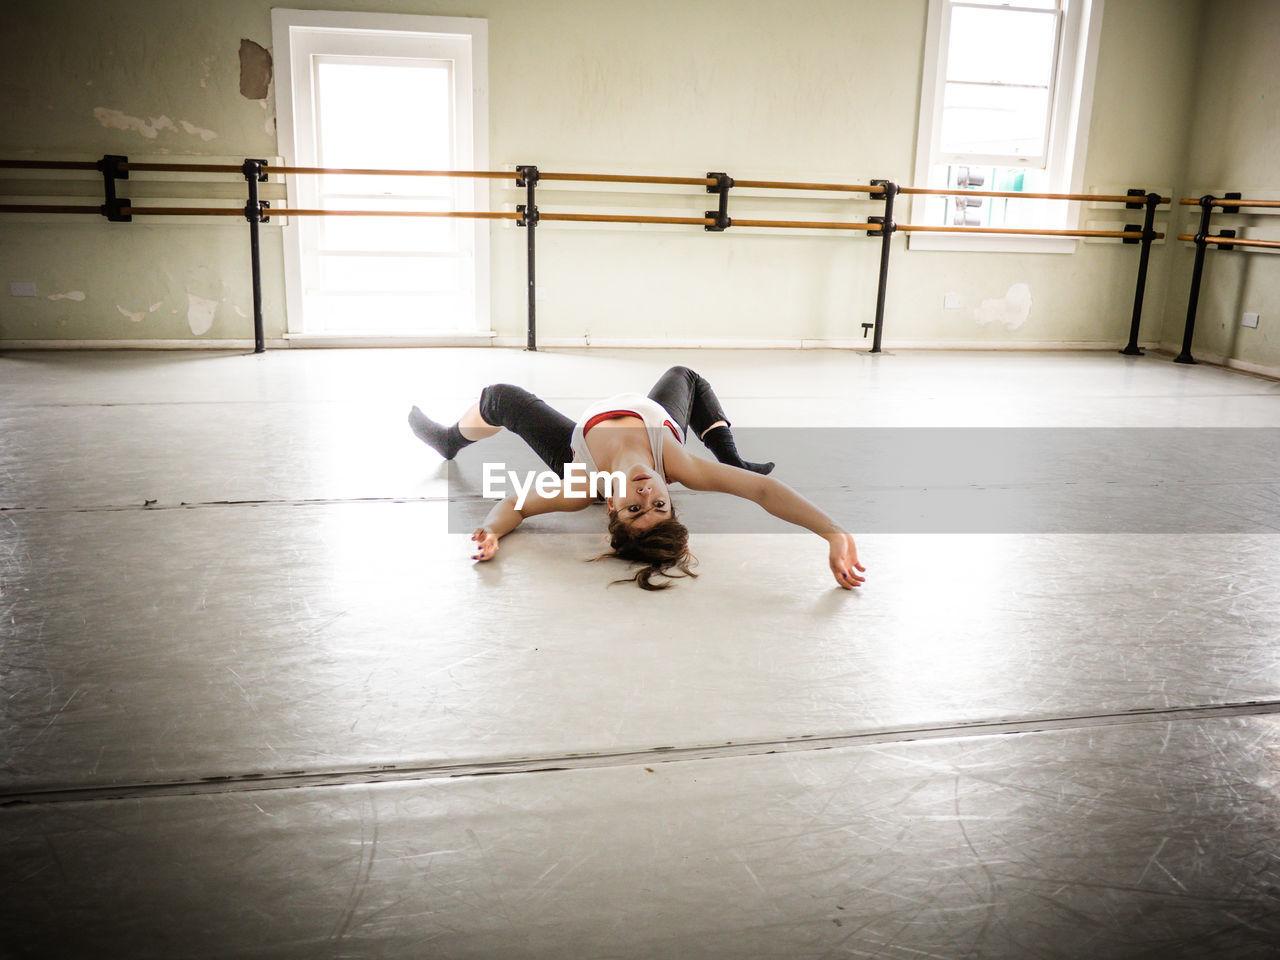 Full Length Ballet Dancer Practicing In